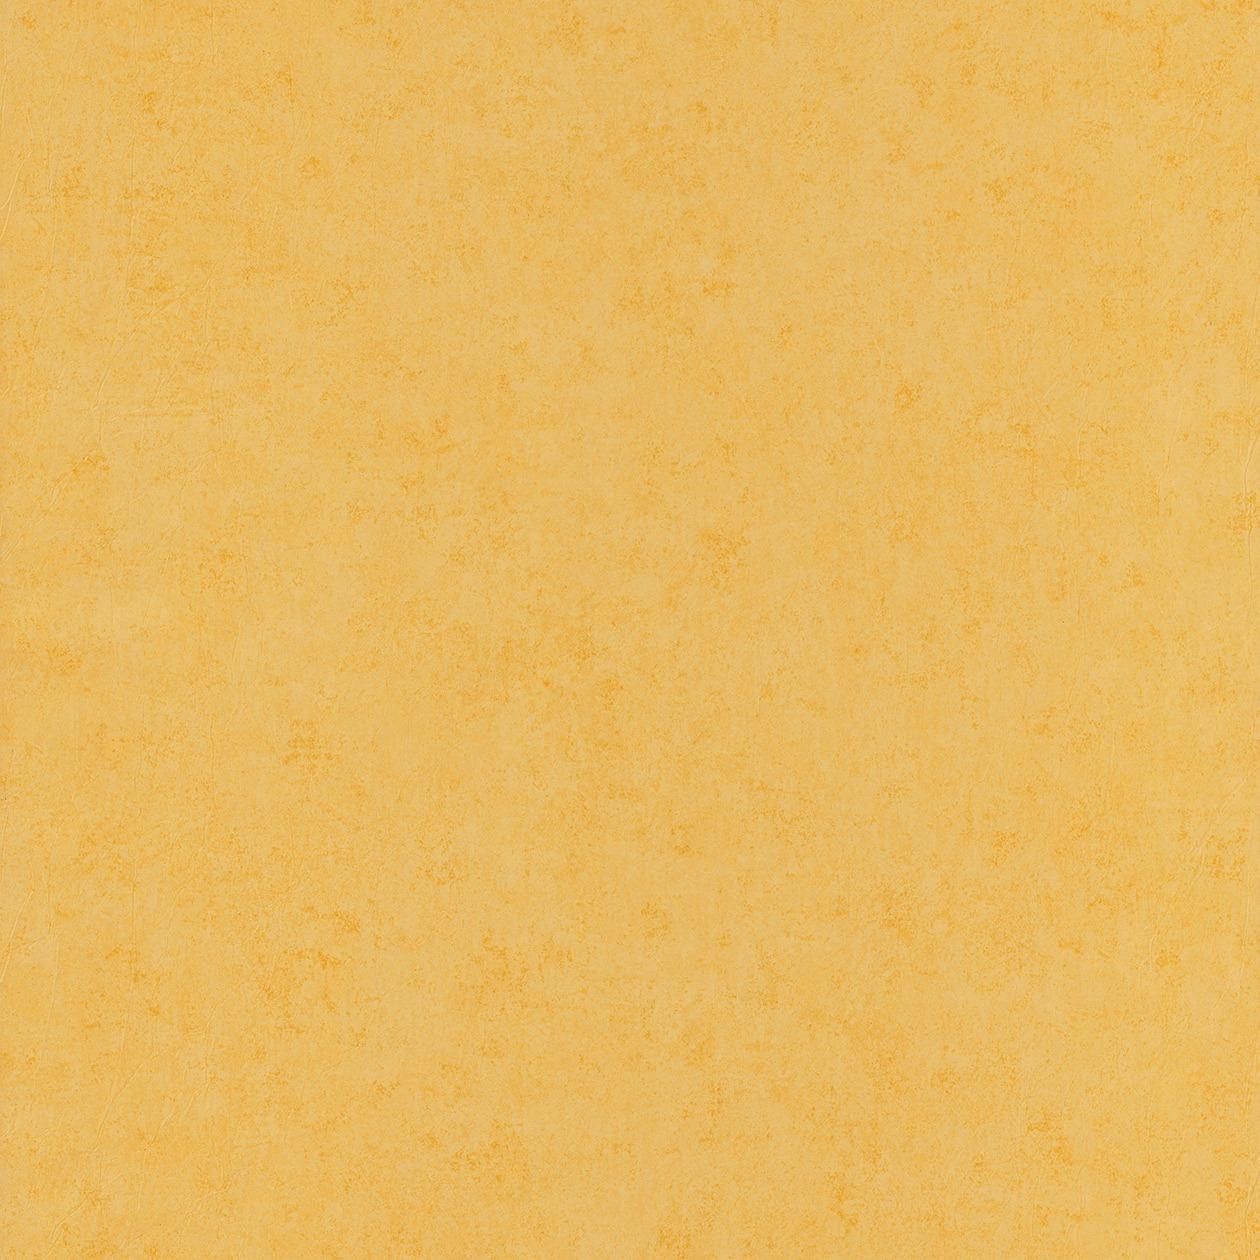 Французские обои Caselio,  коллекция Sherwood, артикулSHW67922020